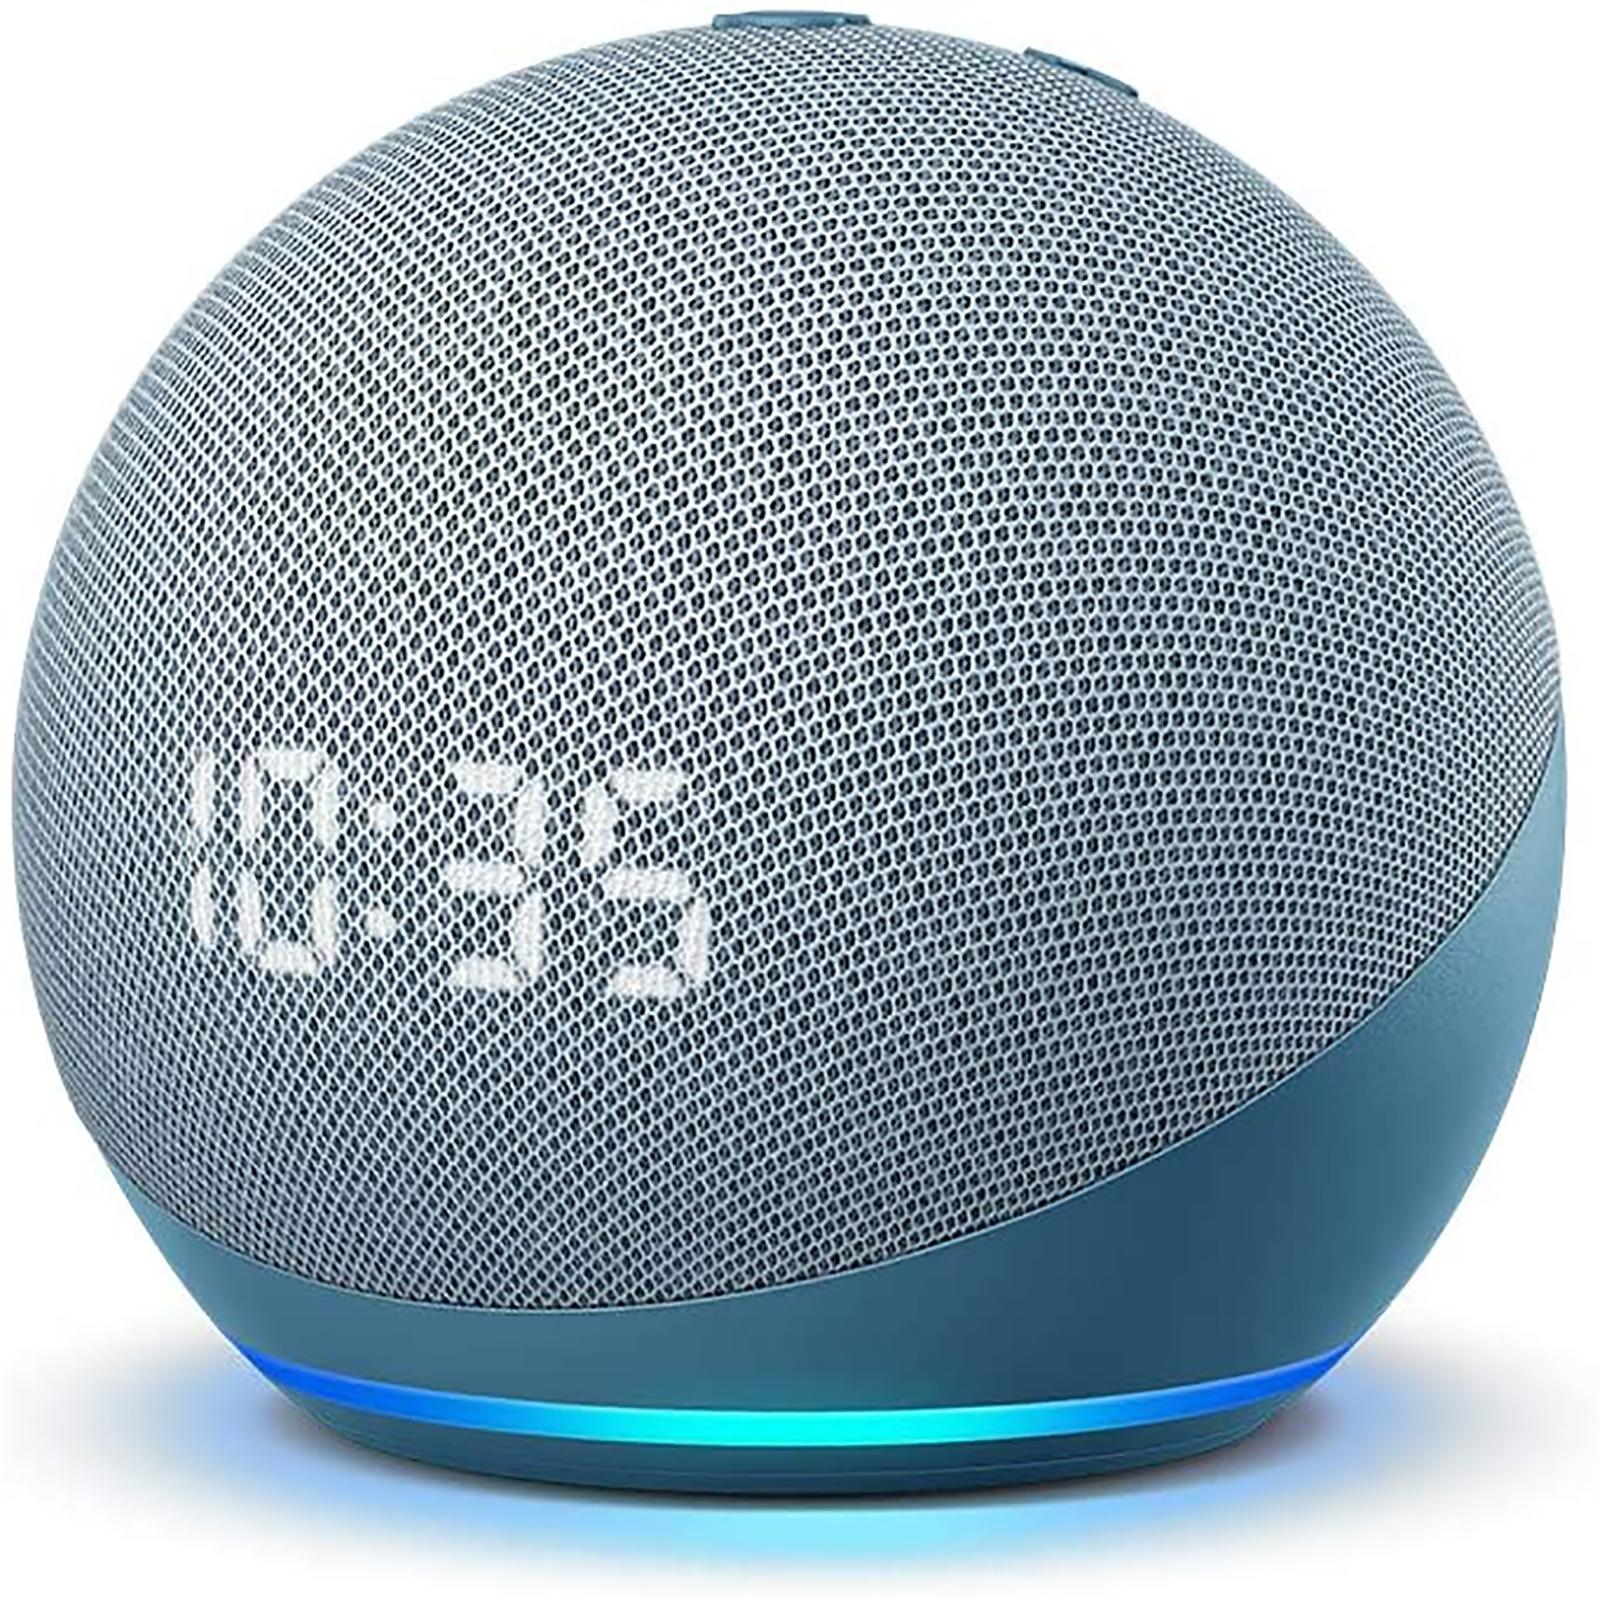 Amazon Twilight Blue 4th Generation Echo Dot With Clock And Alexa